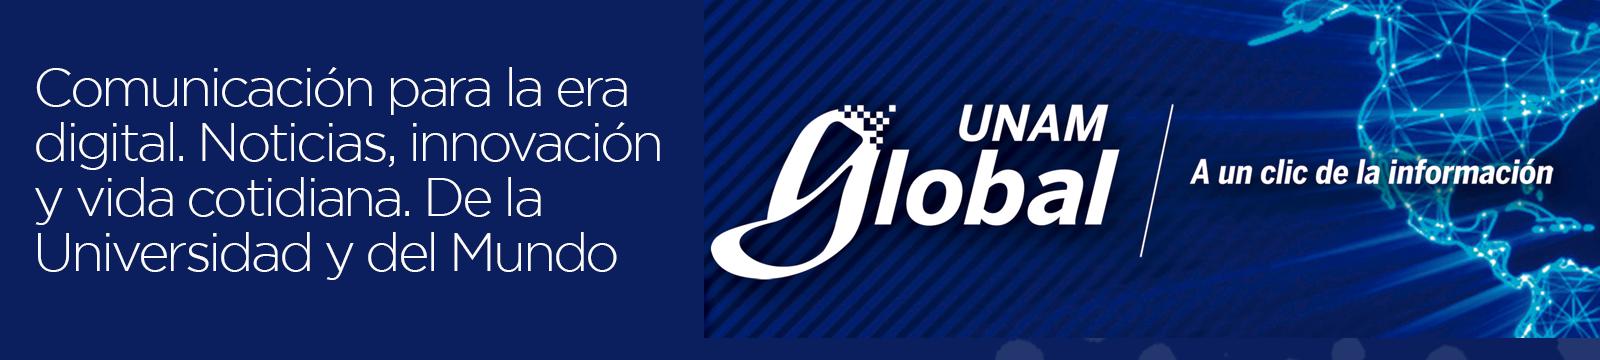 UNAM global 2016